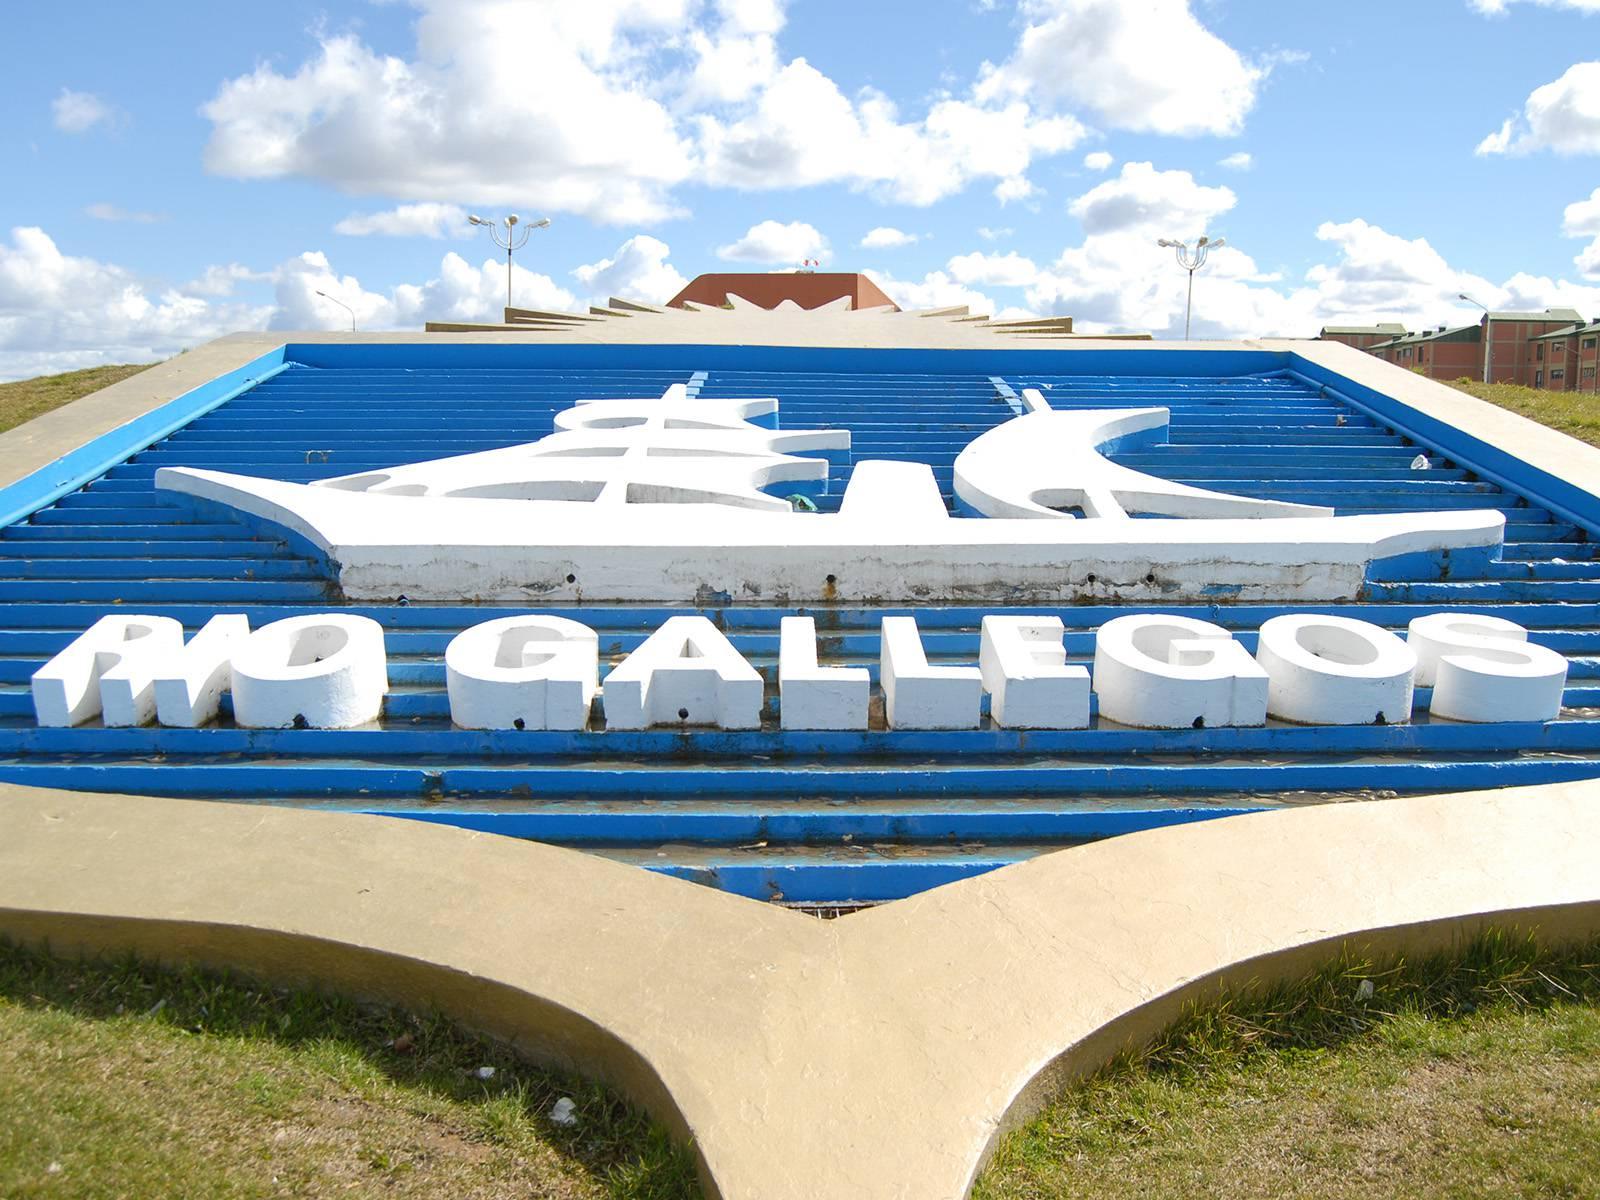 Valores de entradas anticipadas turismo nacional apat for Jardin 17 rio gallegos